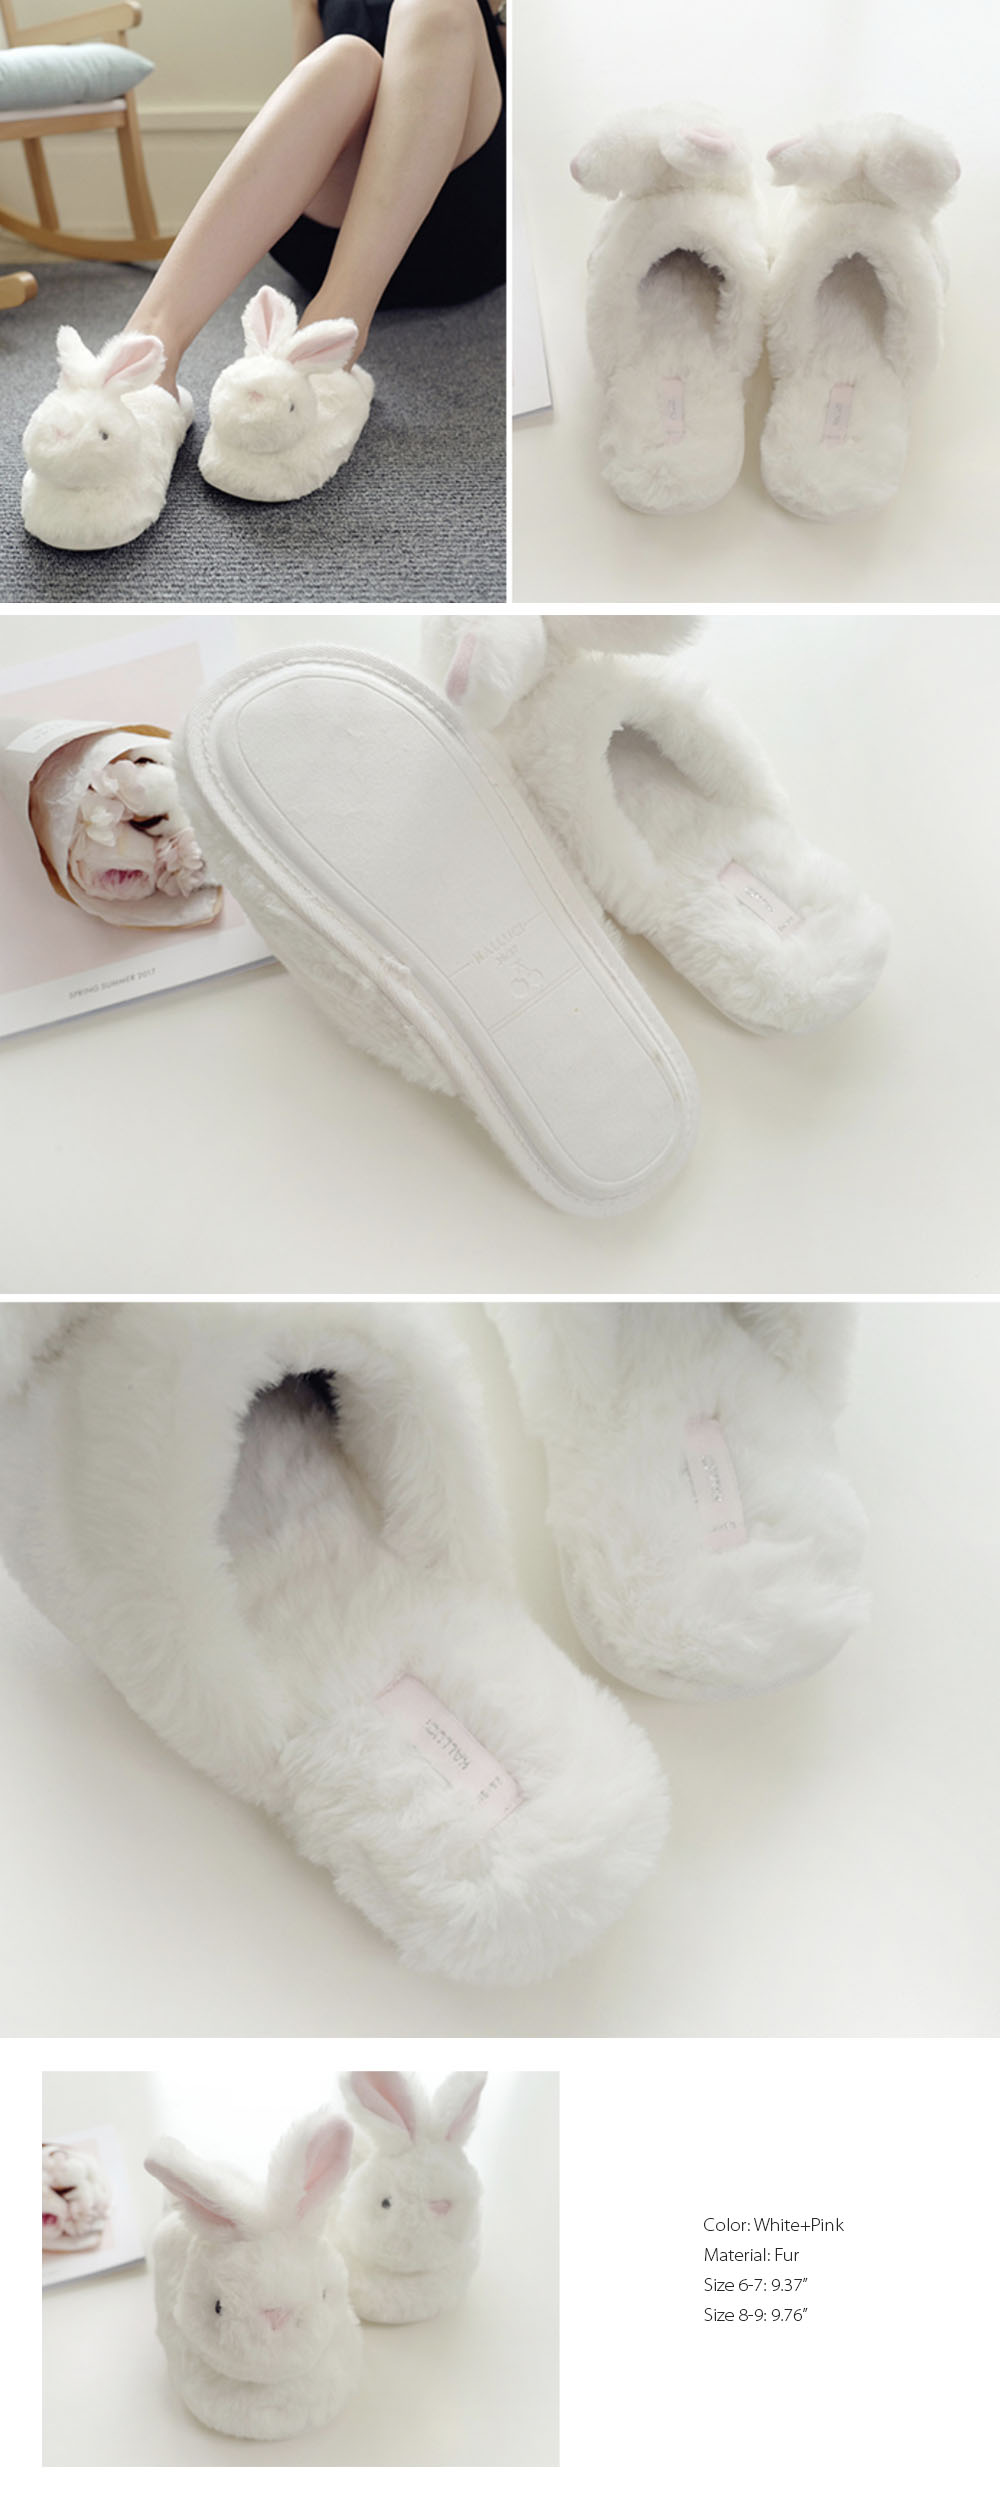 Rabbit Slipper Cute Collection